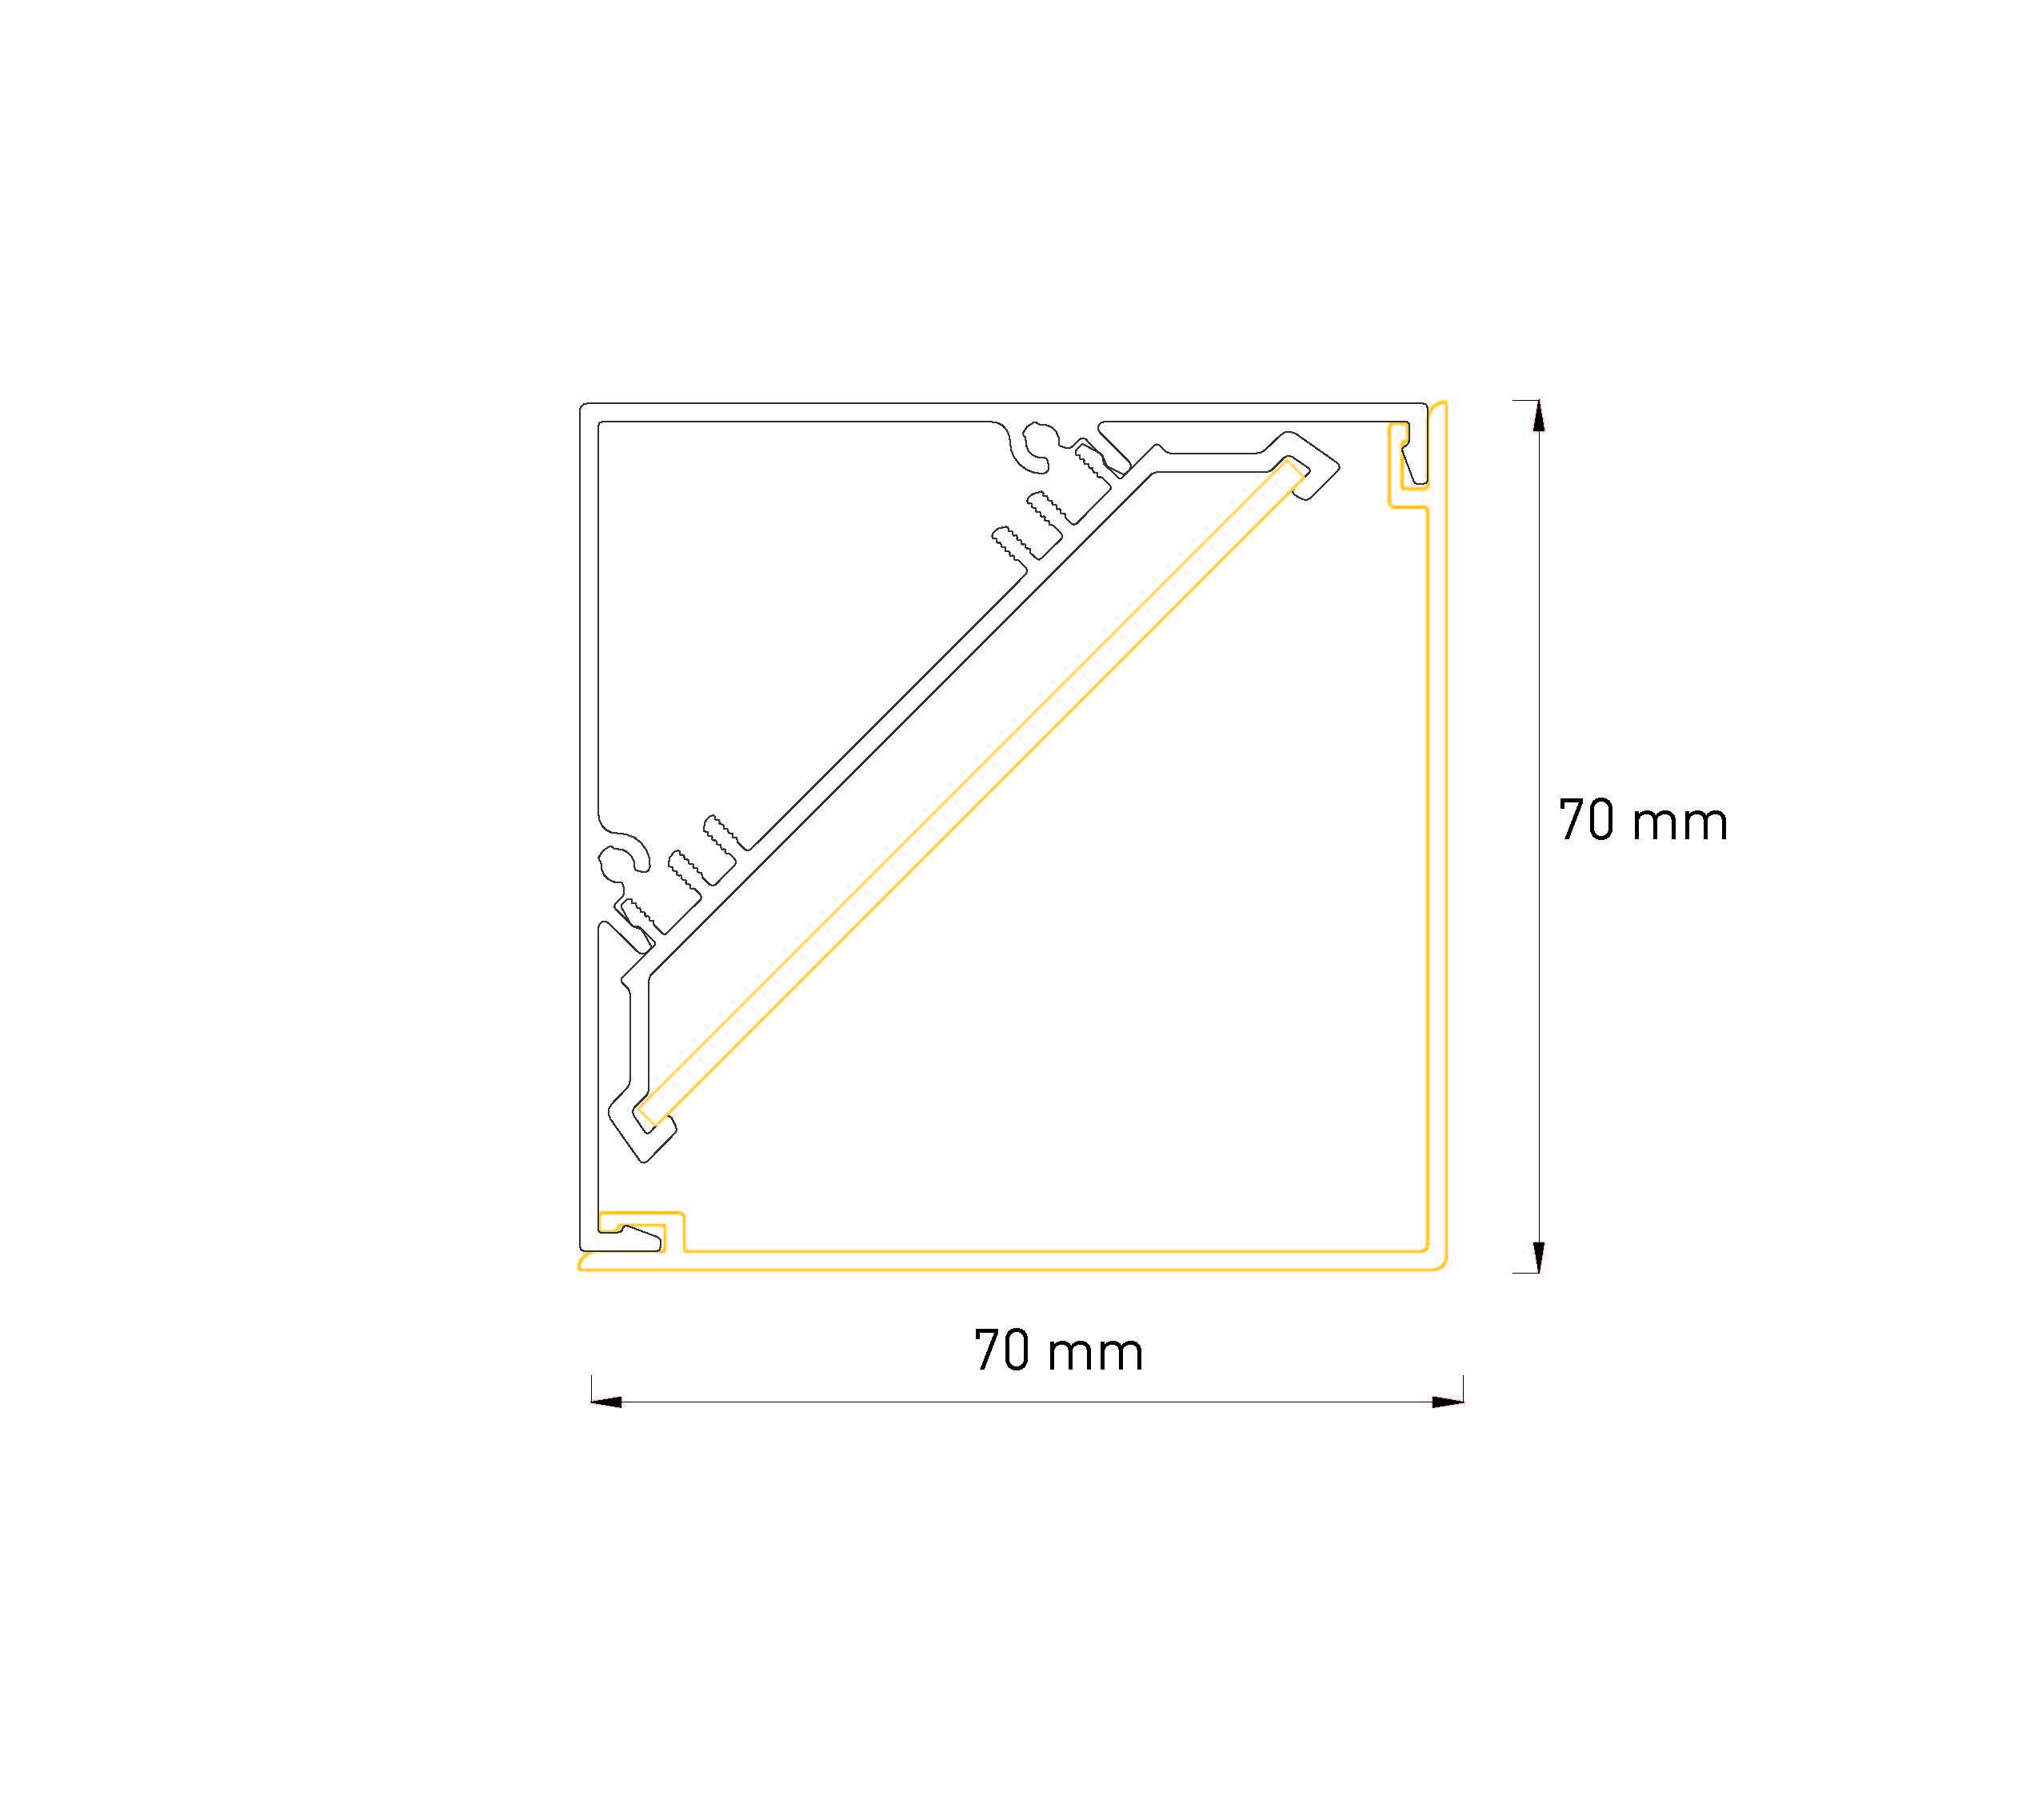 LED Profilleuchte Lin SML Eckprofil Abmessung